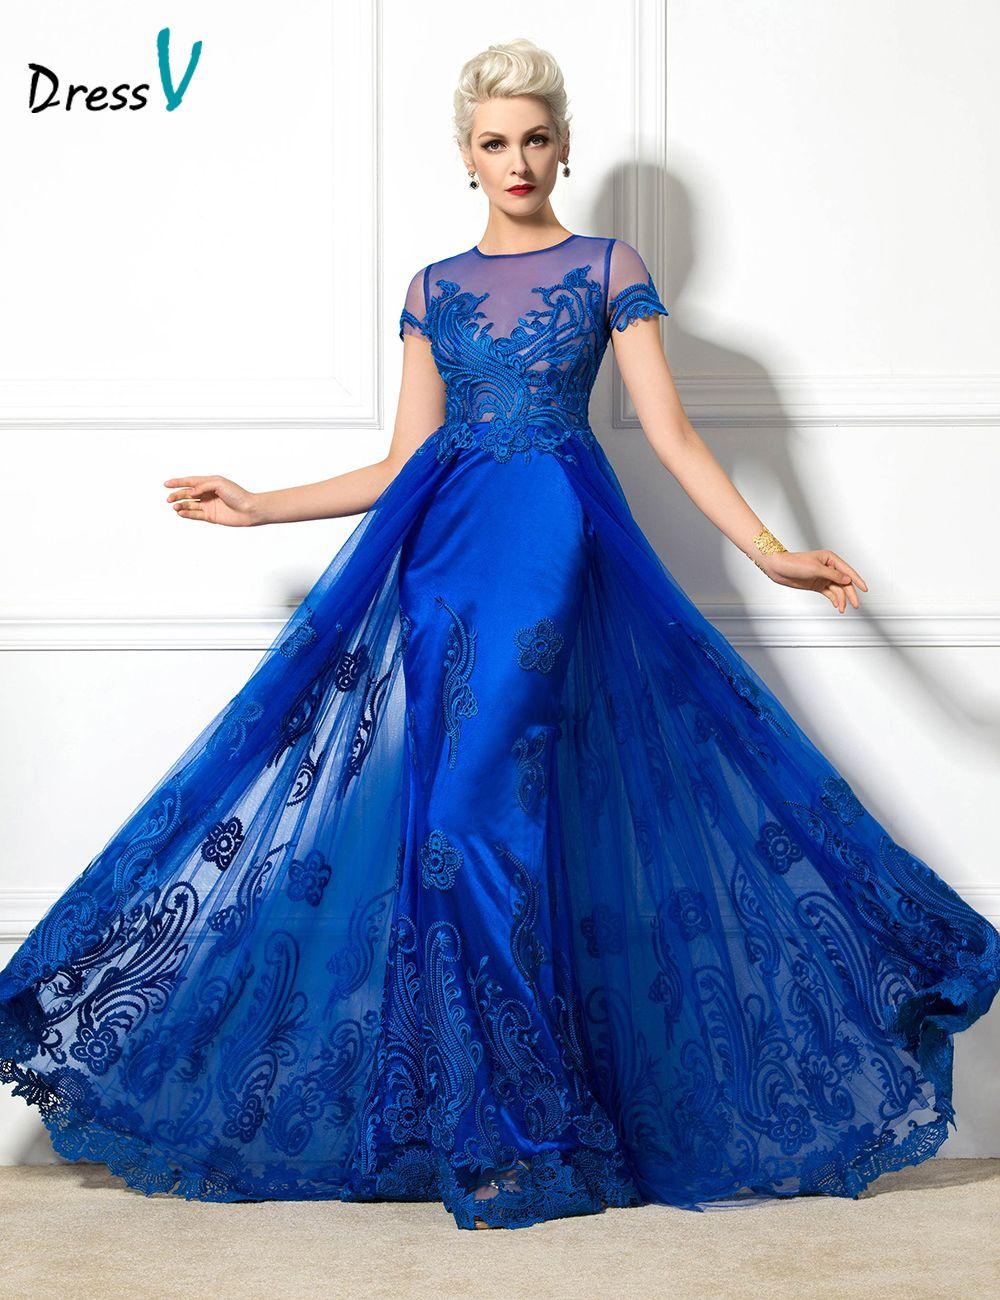 Dressv 2017 Jewel Neck Short Sleeve A-Line evening dress Appliques long elegant dark royal blue sexy lace up party Evening Dress